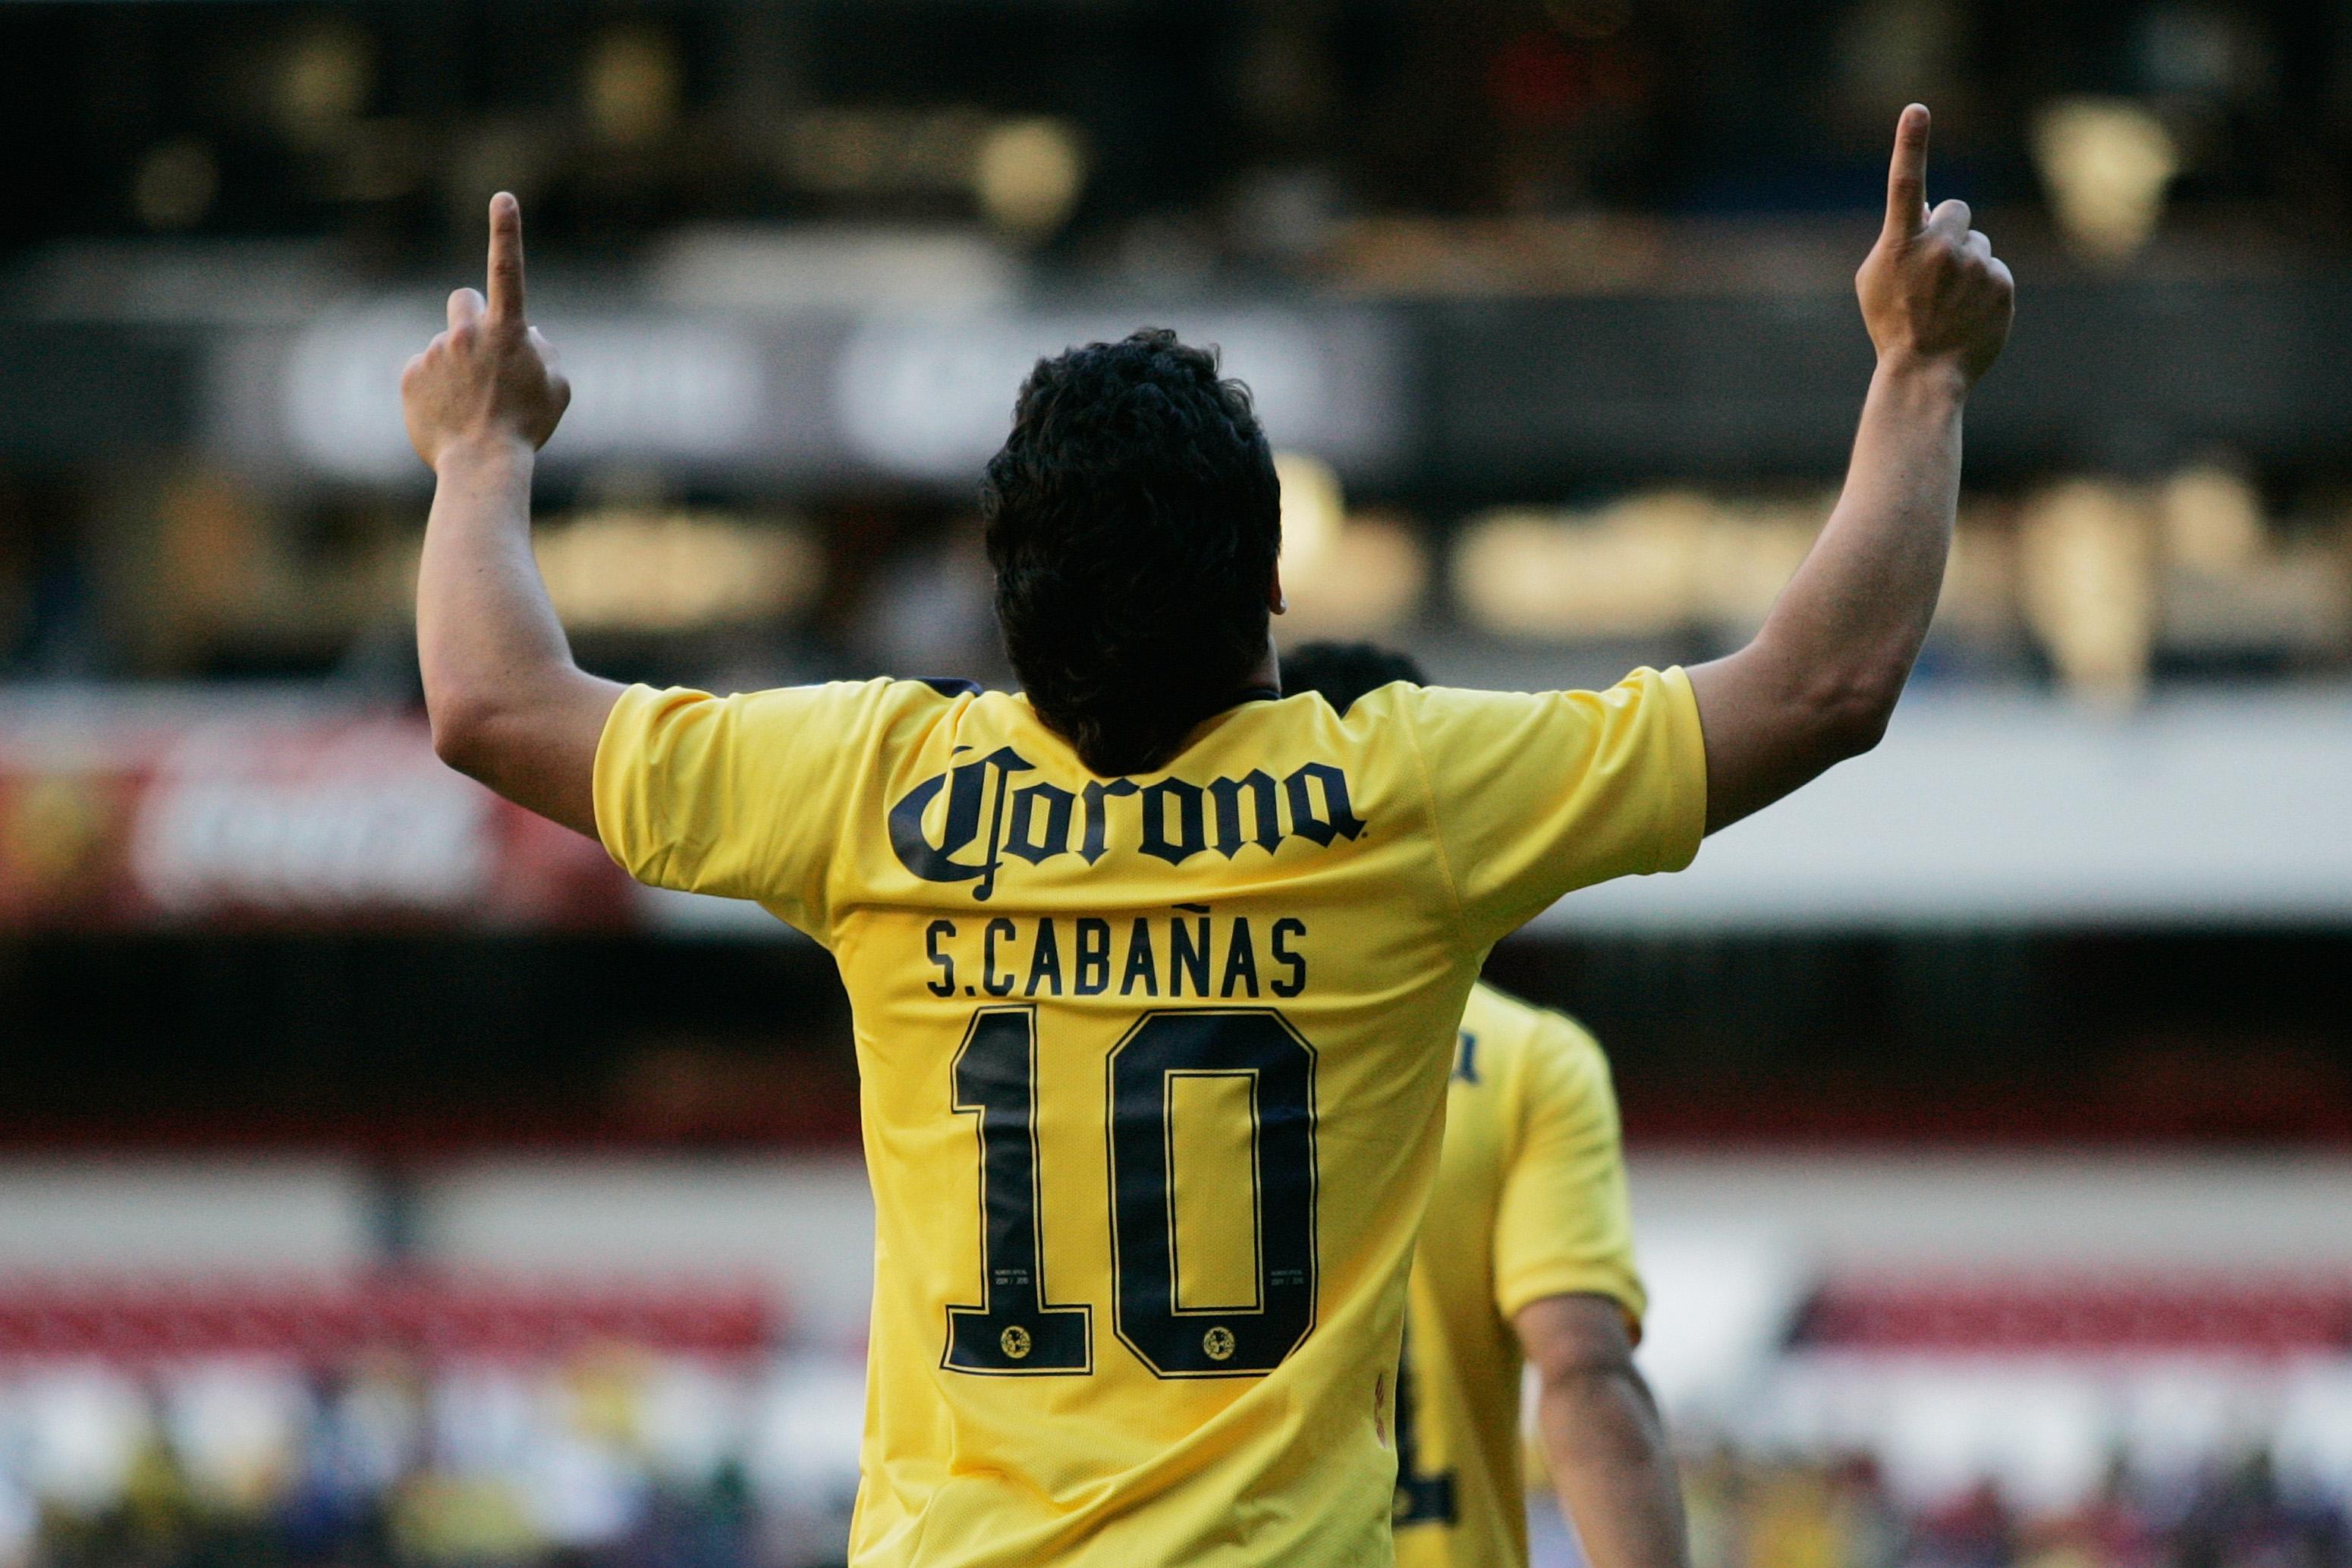 Dia del Niño, Salvador Cabañas, Deportivo Aragon, Equipo Amateur, Ficha, Oaxaca, México, Paraguay, Actualmente